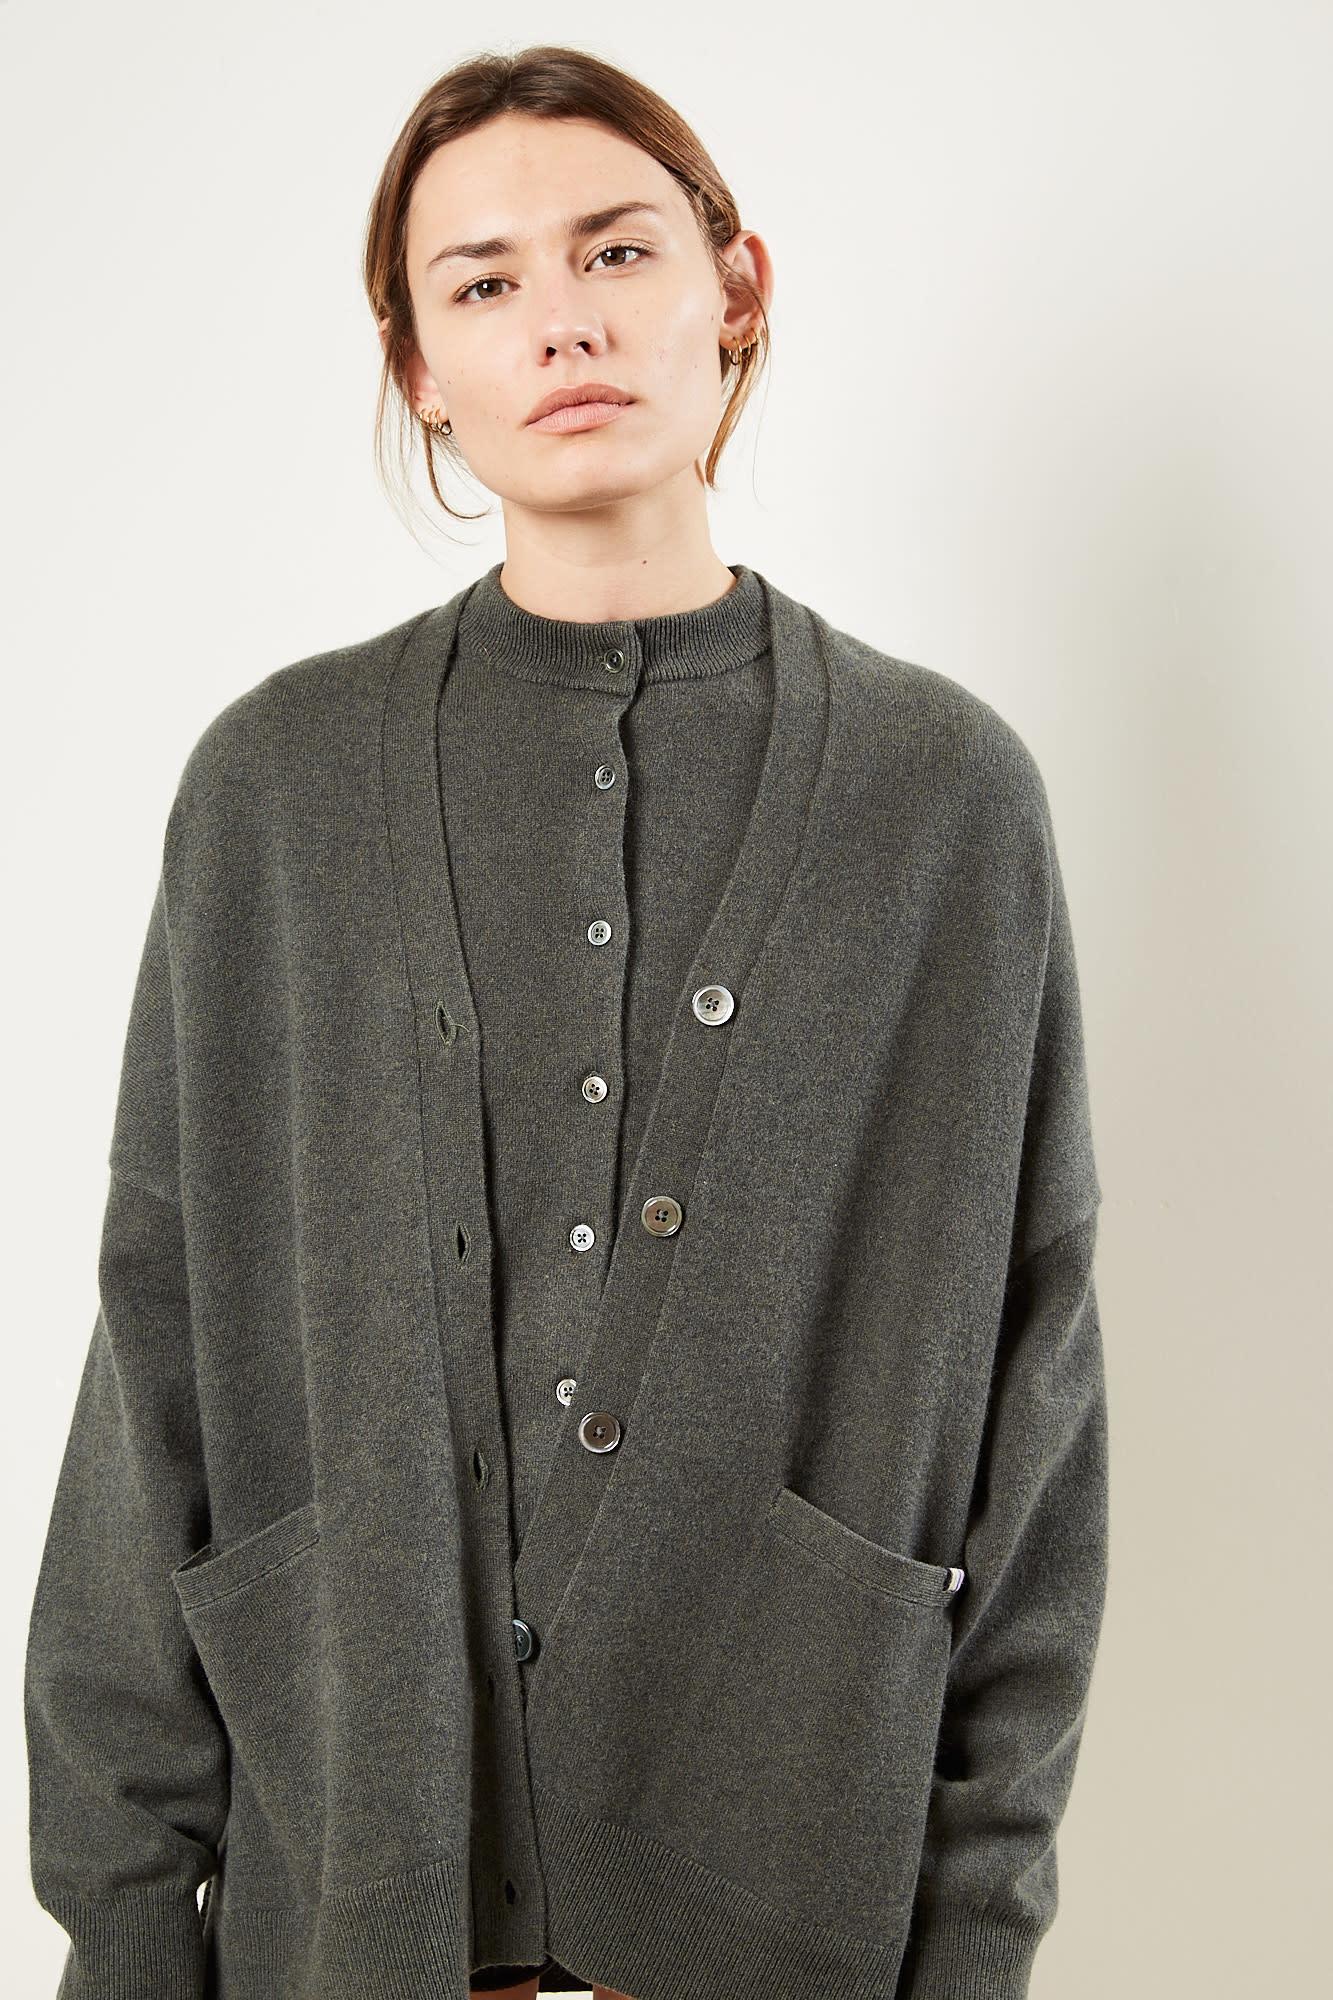 extreme cashmere - No24 Tokio cardigan